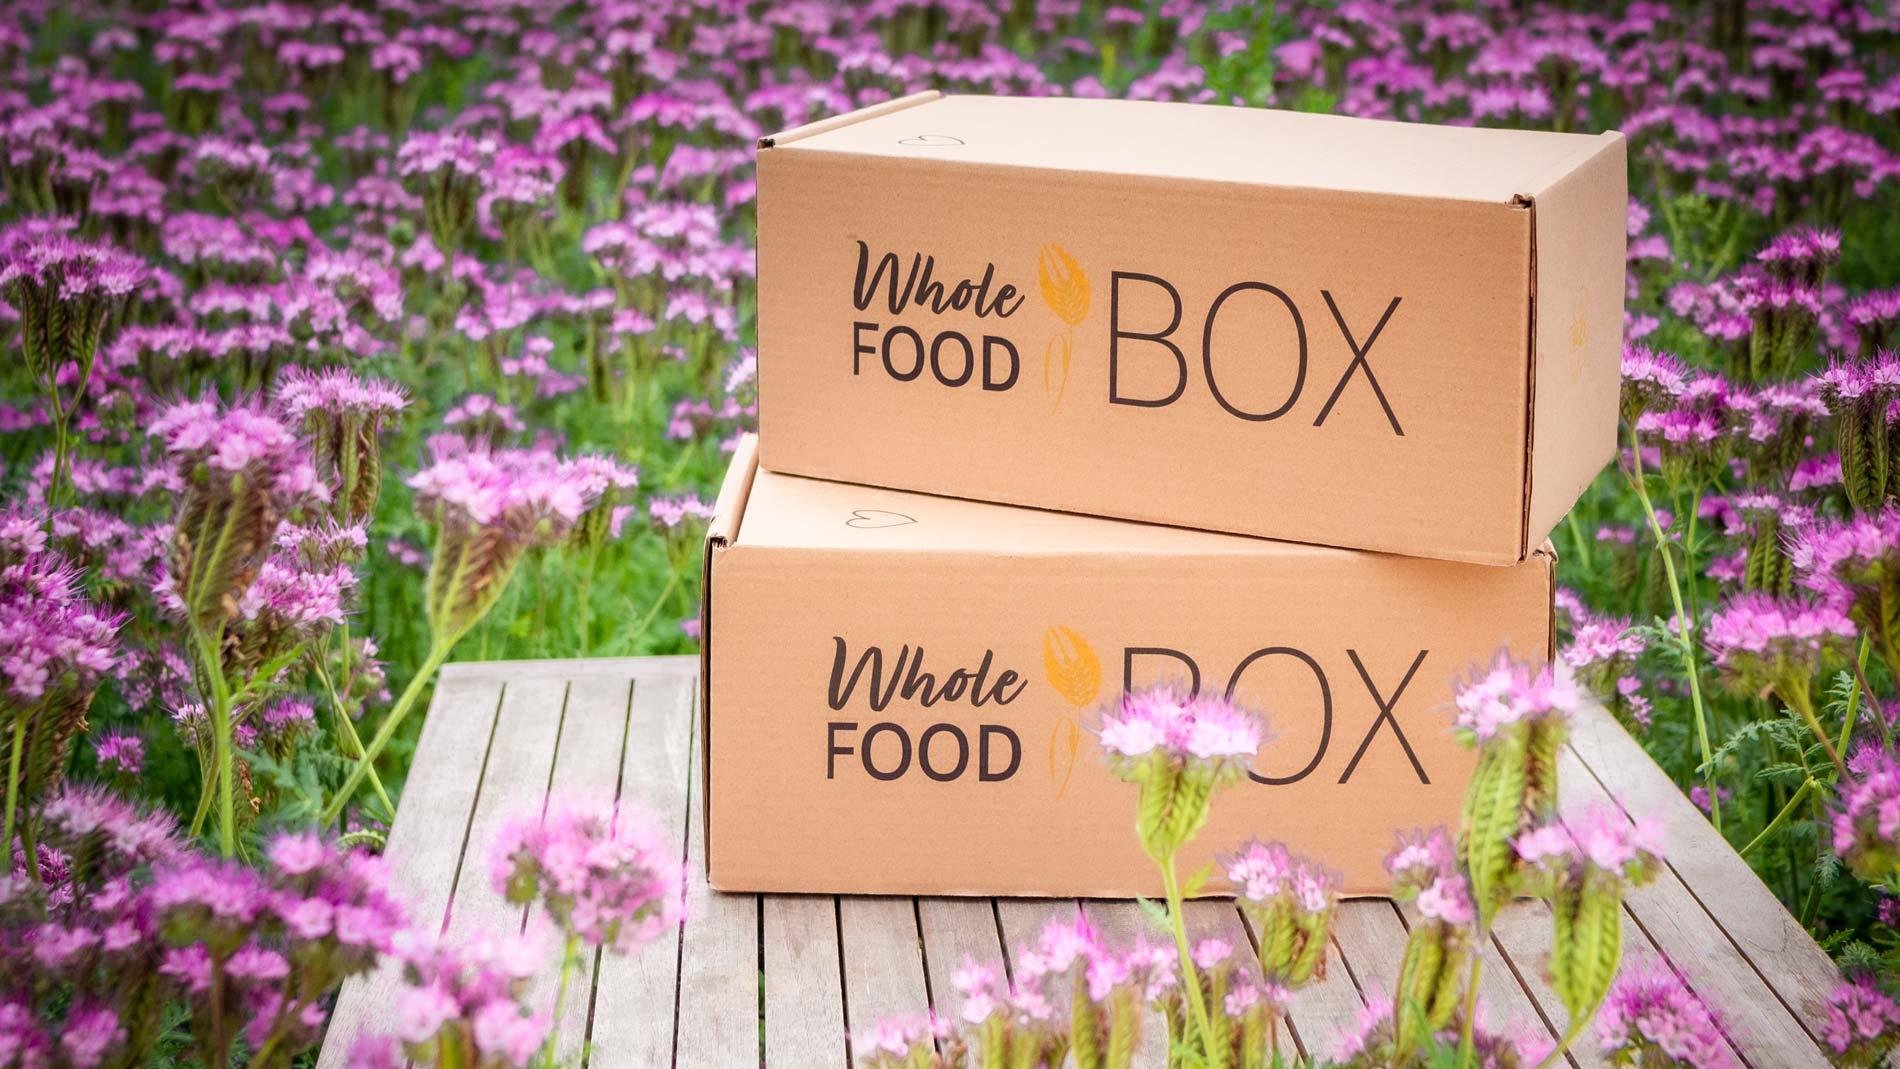 Wohlefoodbox Vollwertkost Lebensmittel